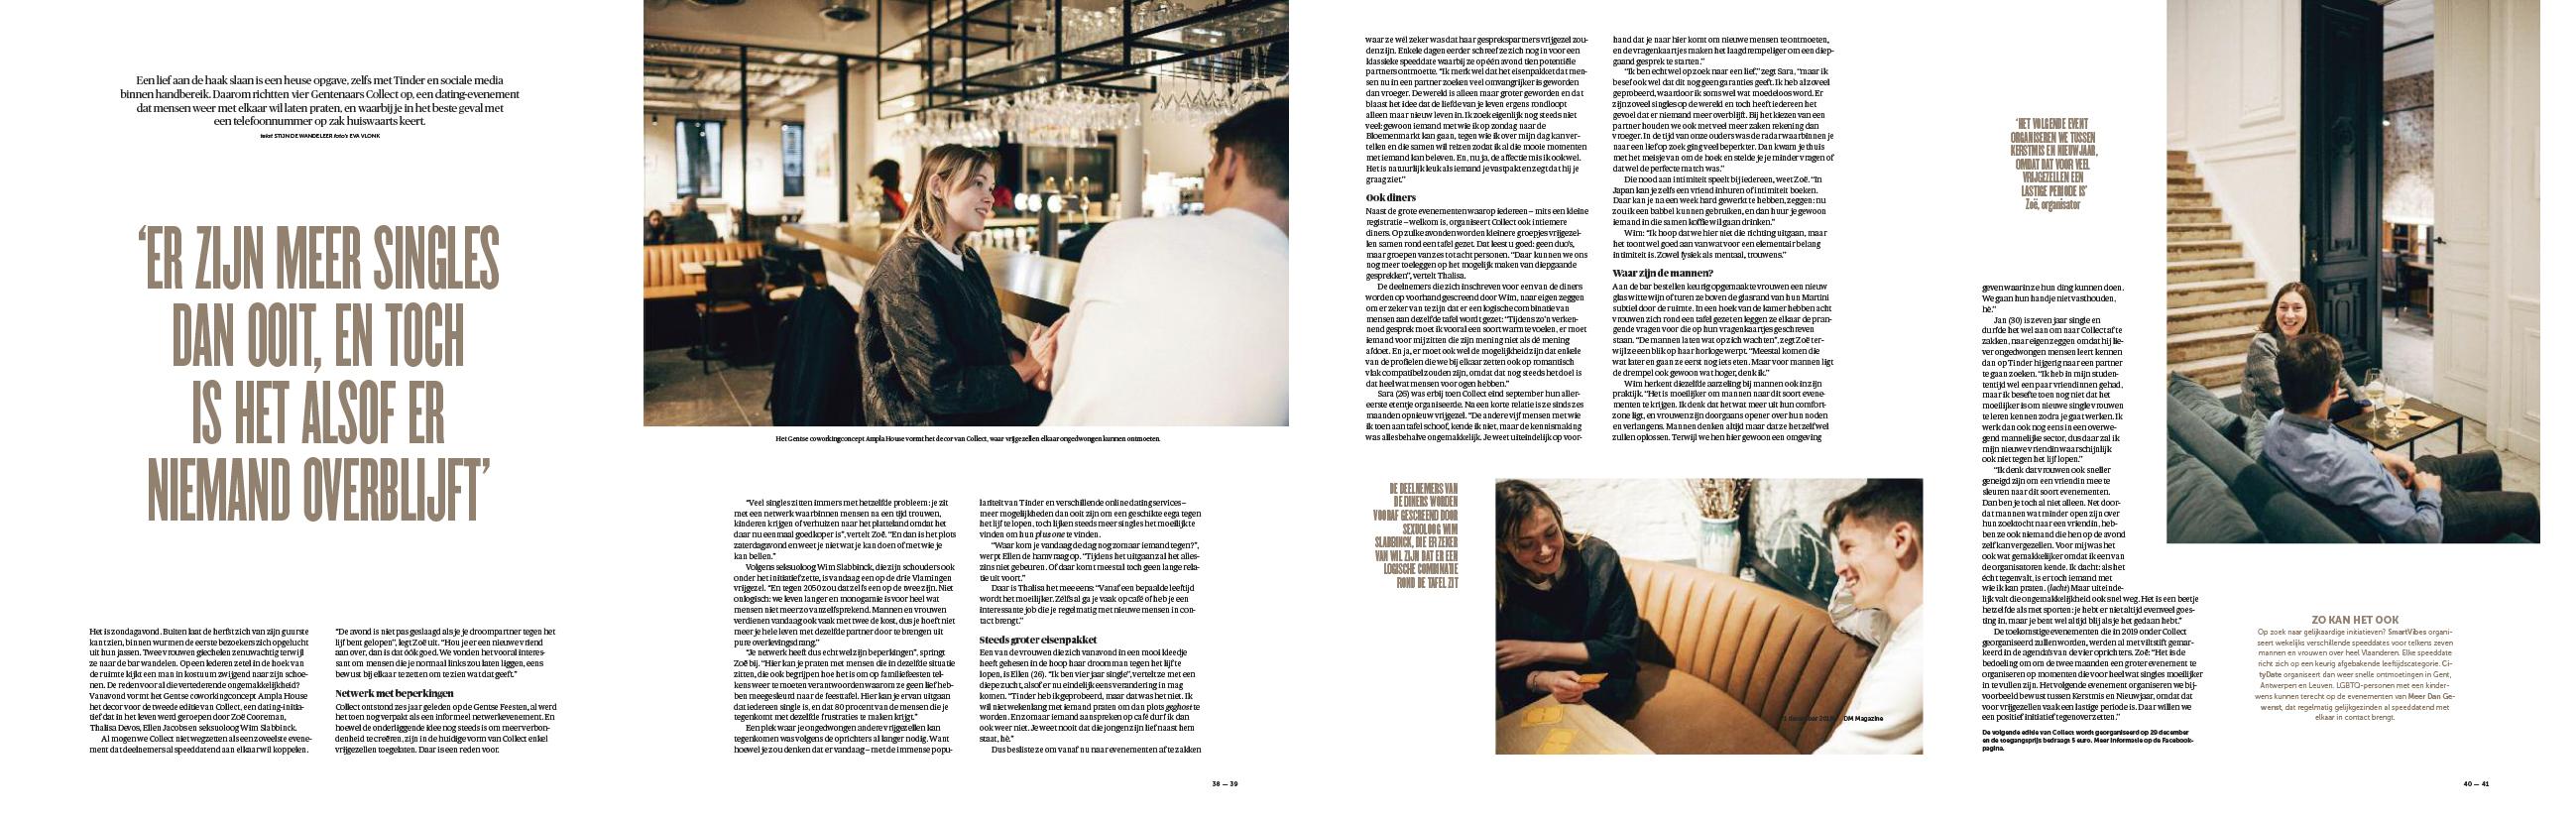 De Morgen Magazine reportage collect singles evenementen